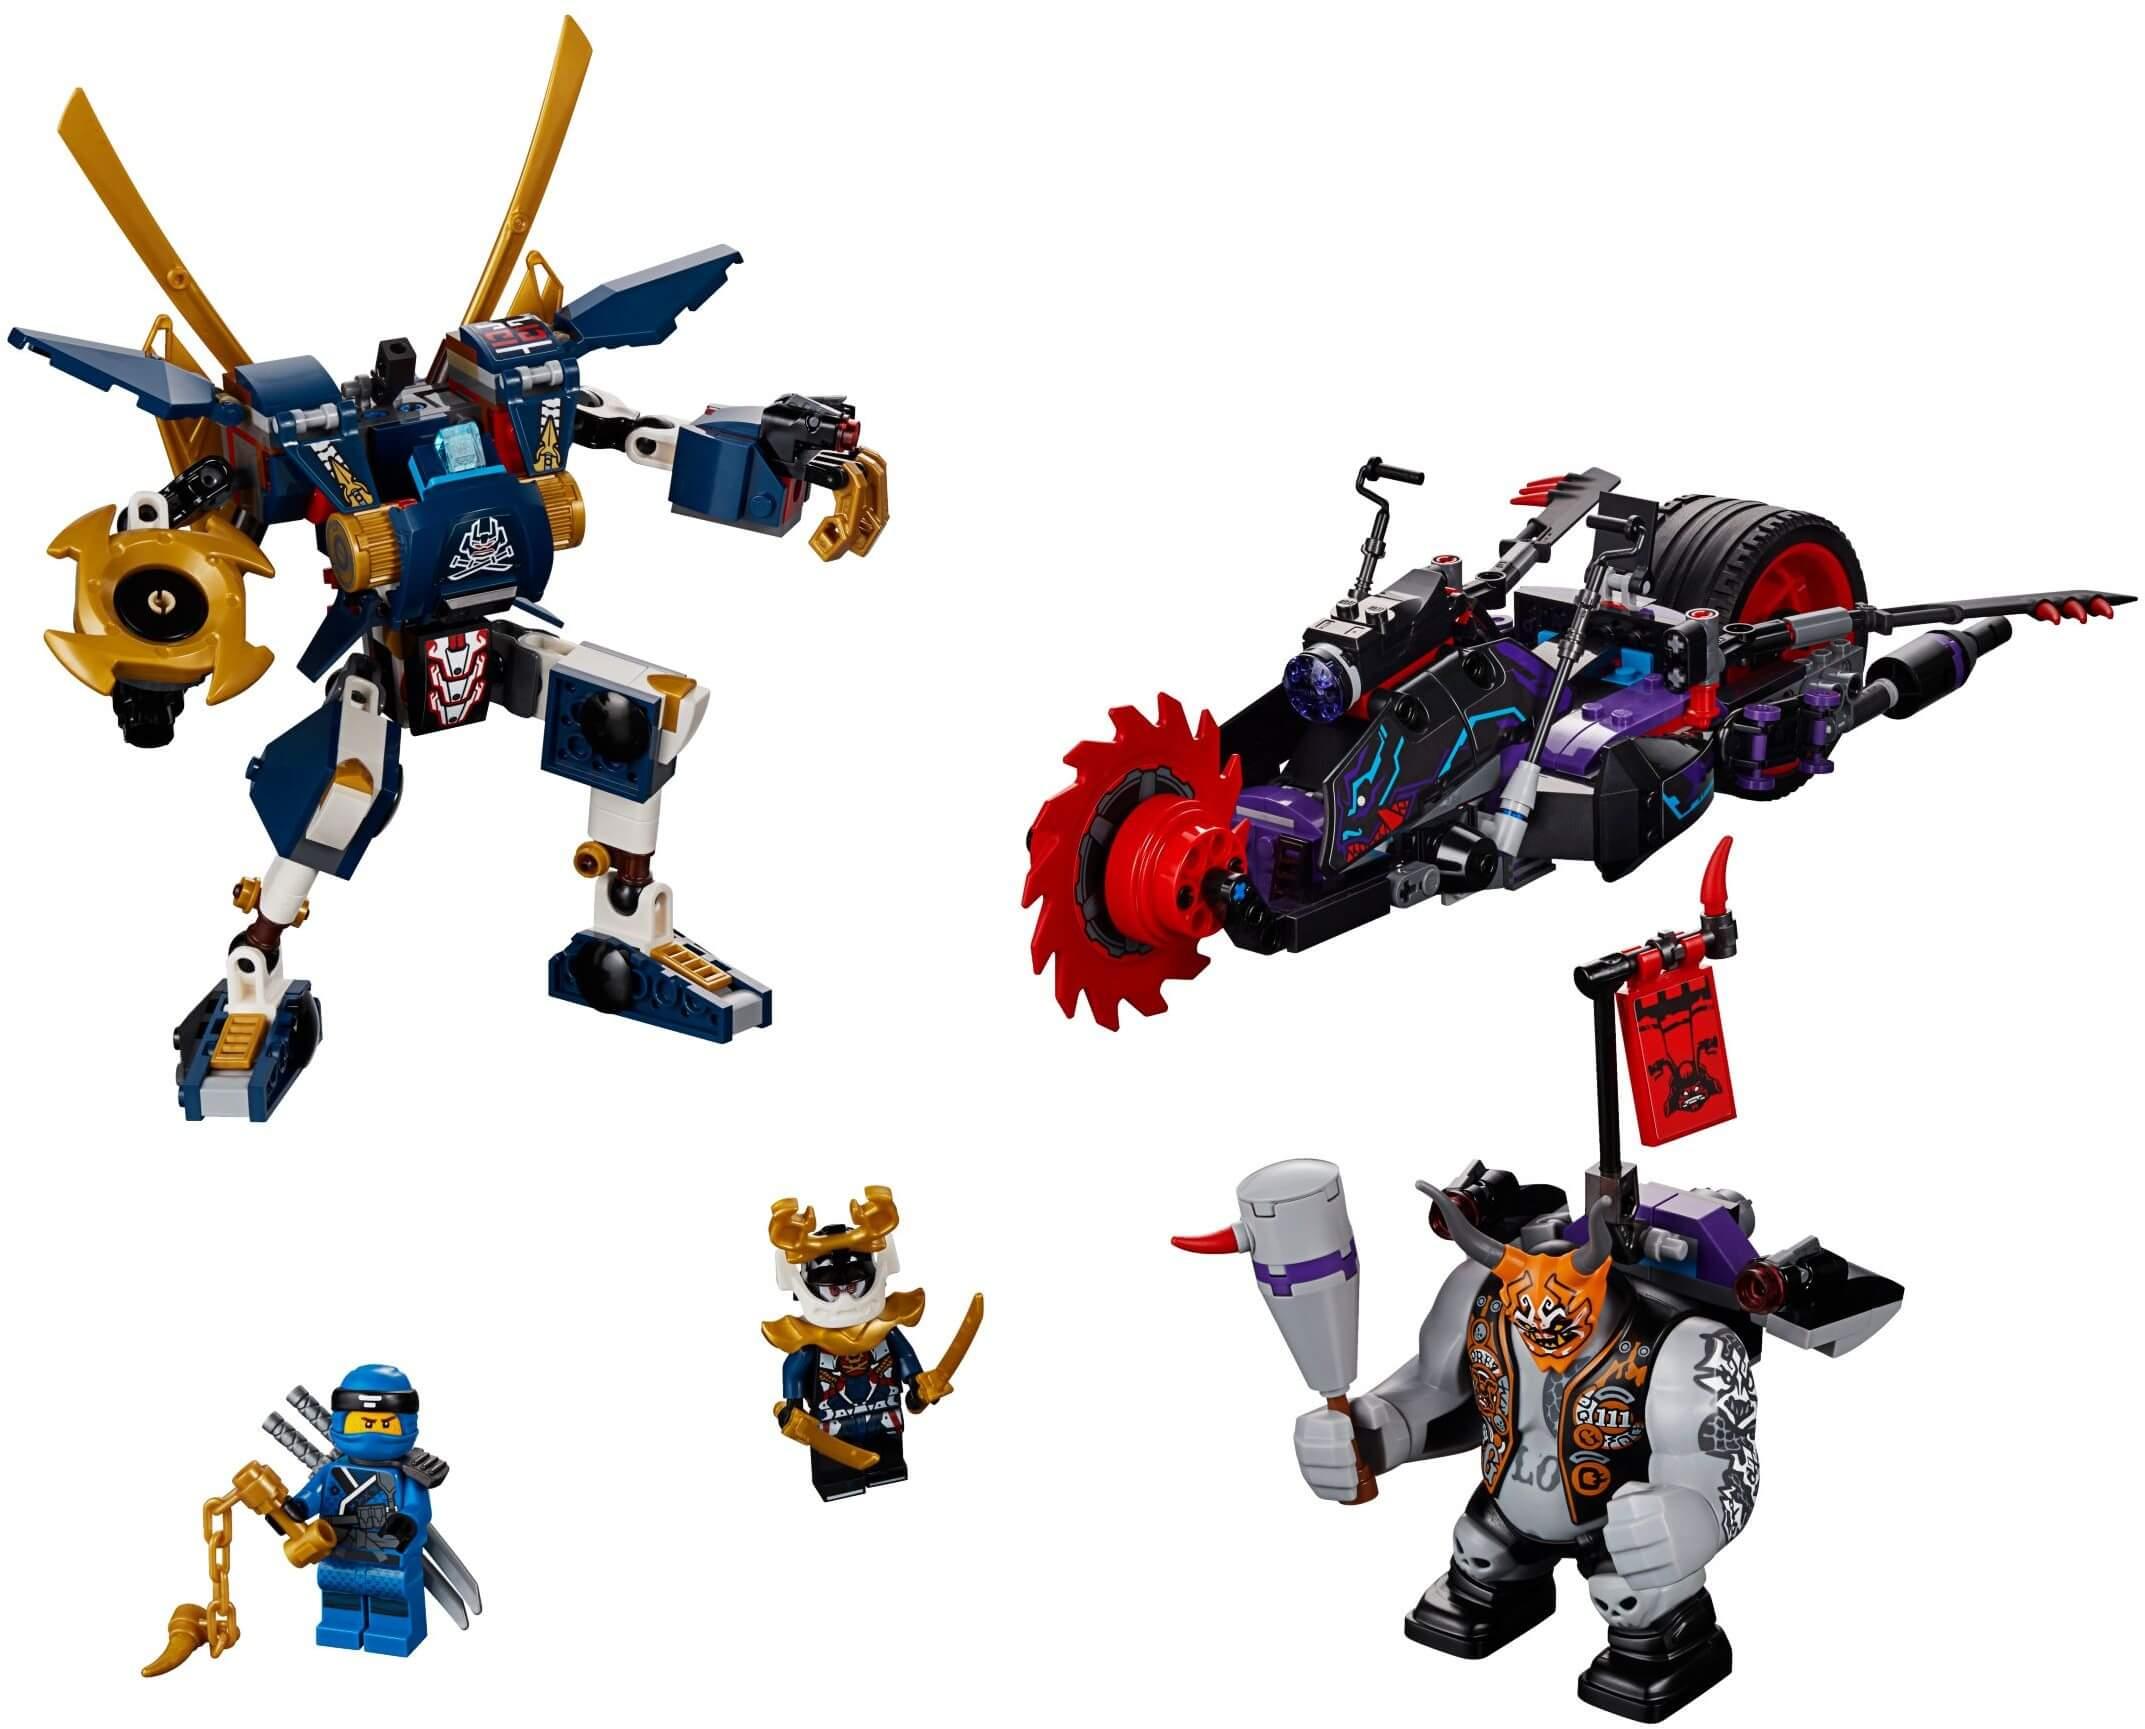 Mua đồ chơi LEGO 70642 - LEGO Ninjago 70642 - Samurai X đại chiến Killow (LEGO Ninjago 70642 Killow vs. Samurai X)